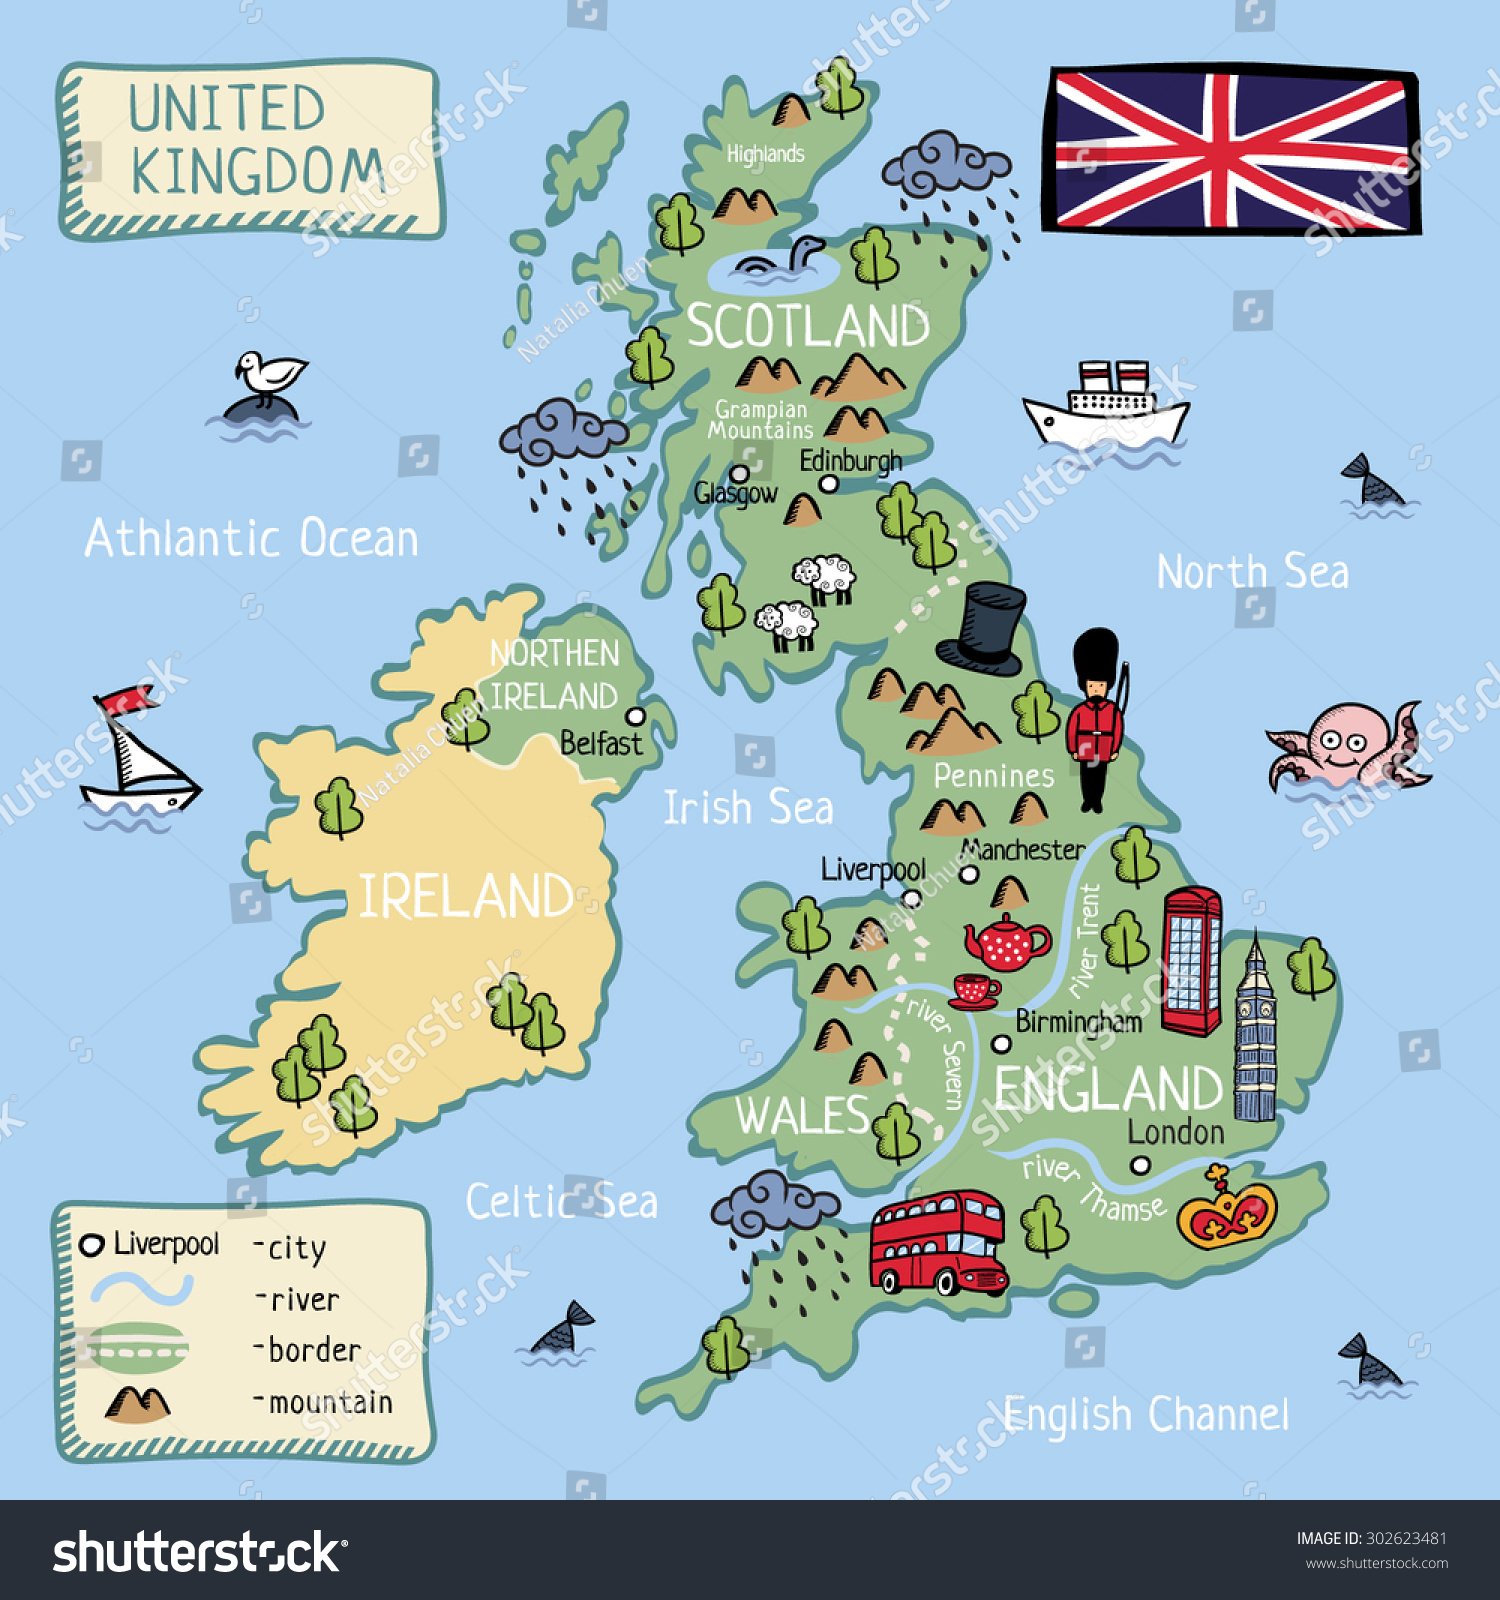 Cartoon Vector Map United Kingdom England Stock Vector - United kingdom map